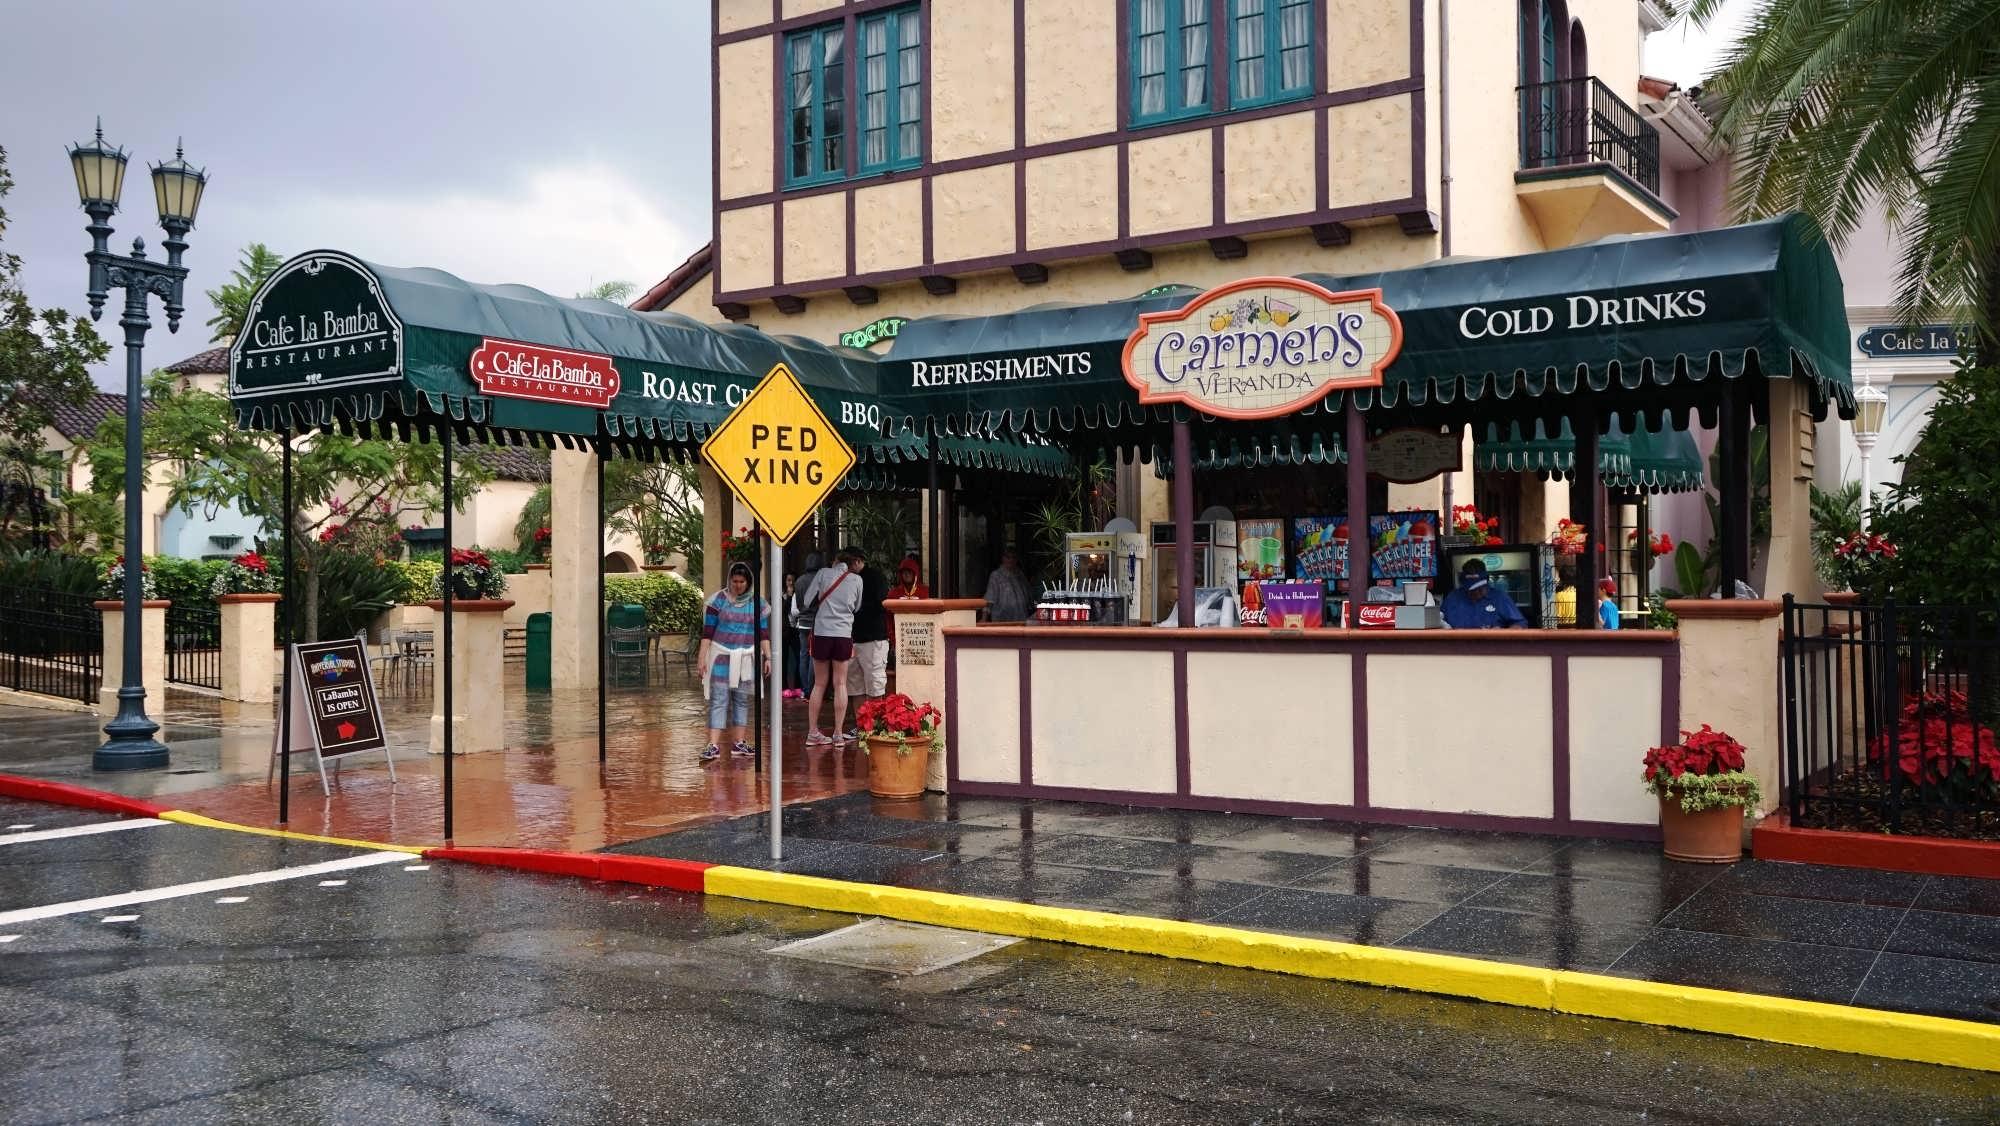 Carmen's Veranda sells snacks and drinks outside of Cafe La Bamba